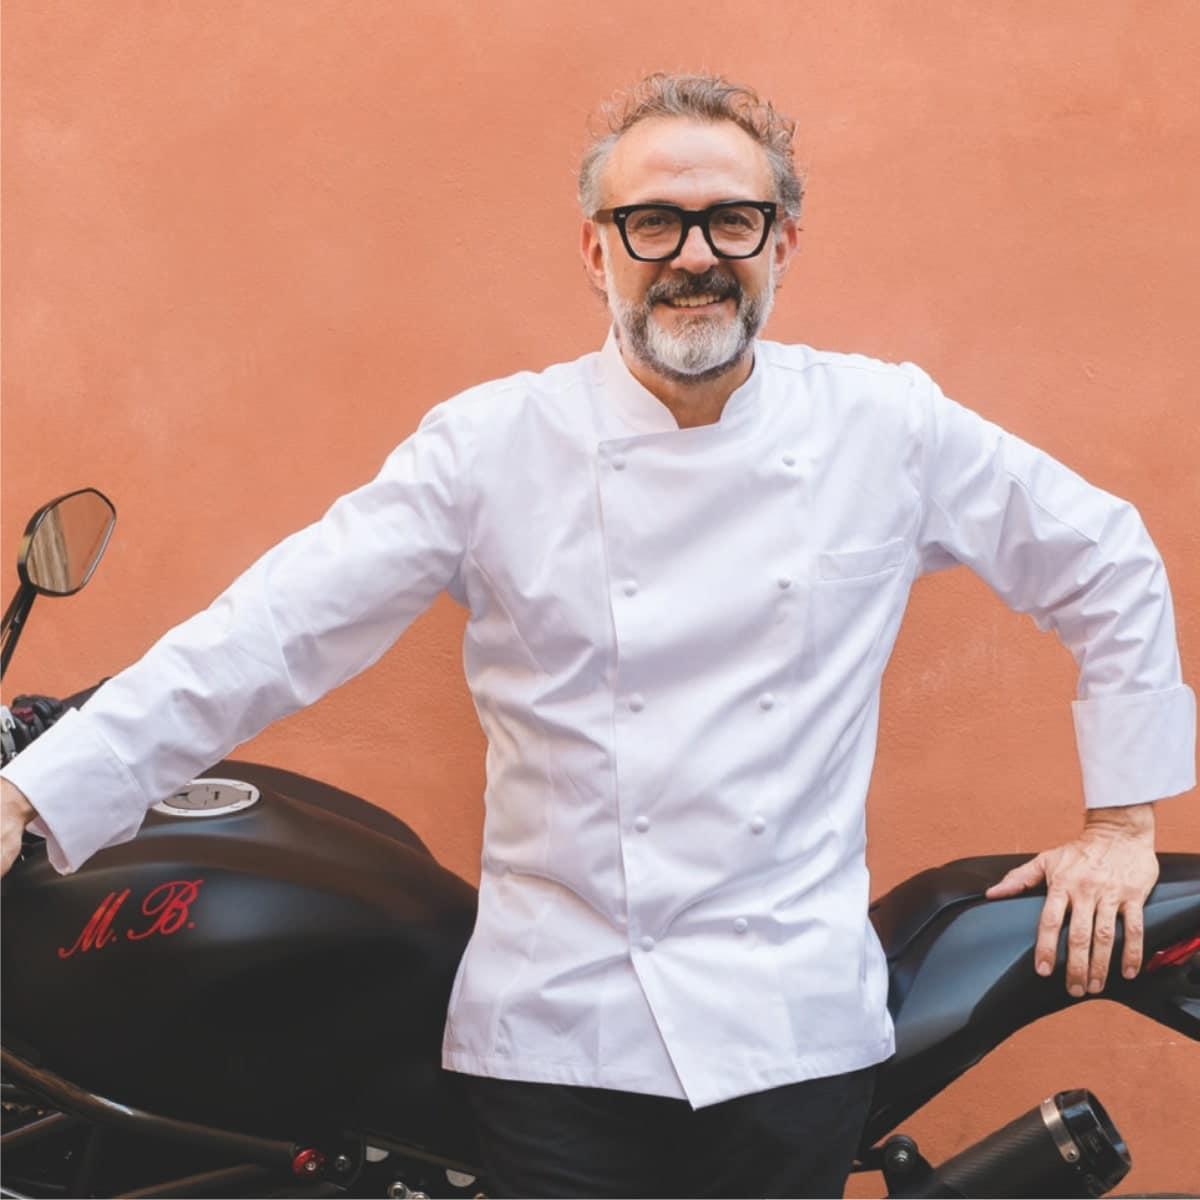 massimo-bottura-giacca-chef-bianca-offerta-online-min